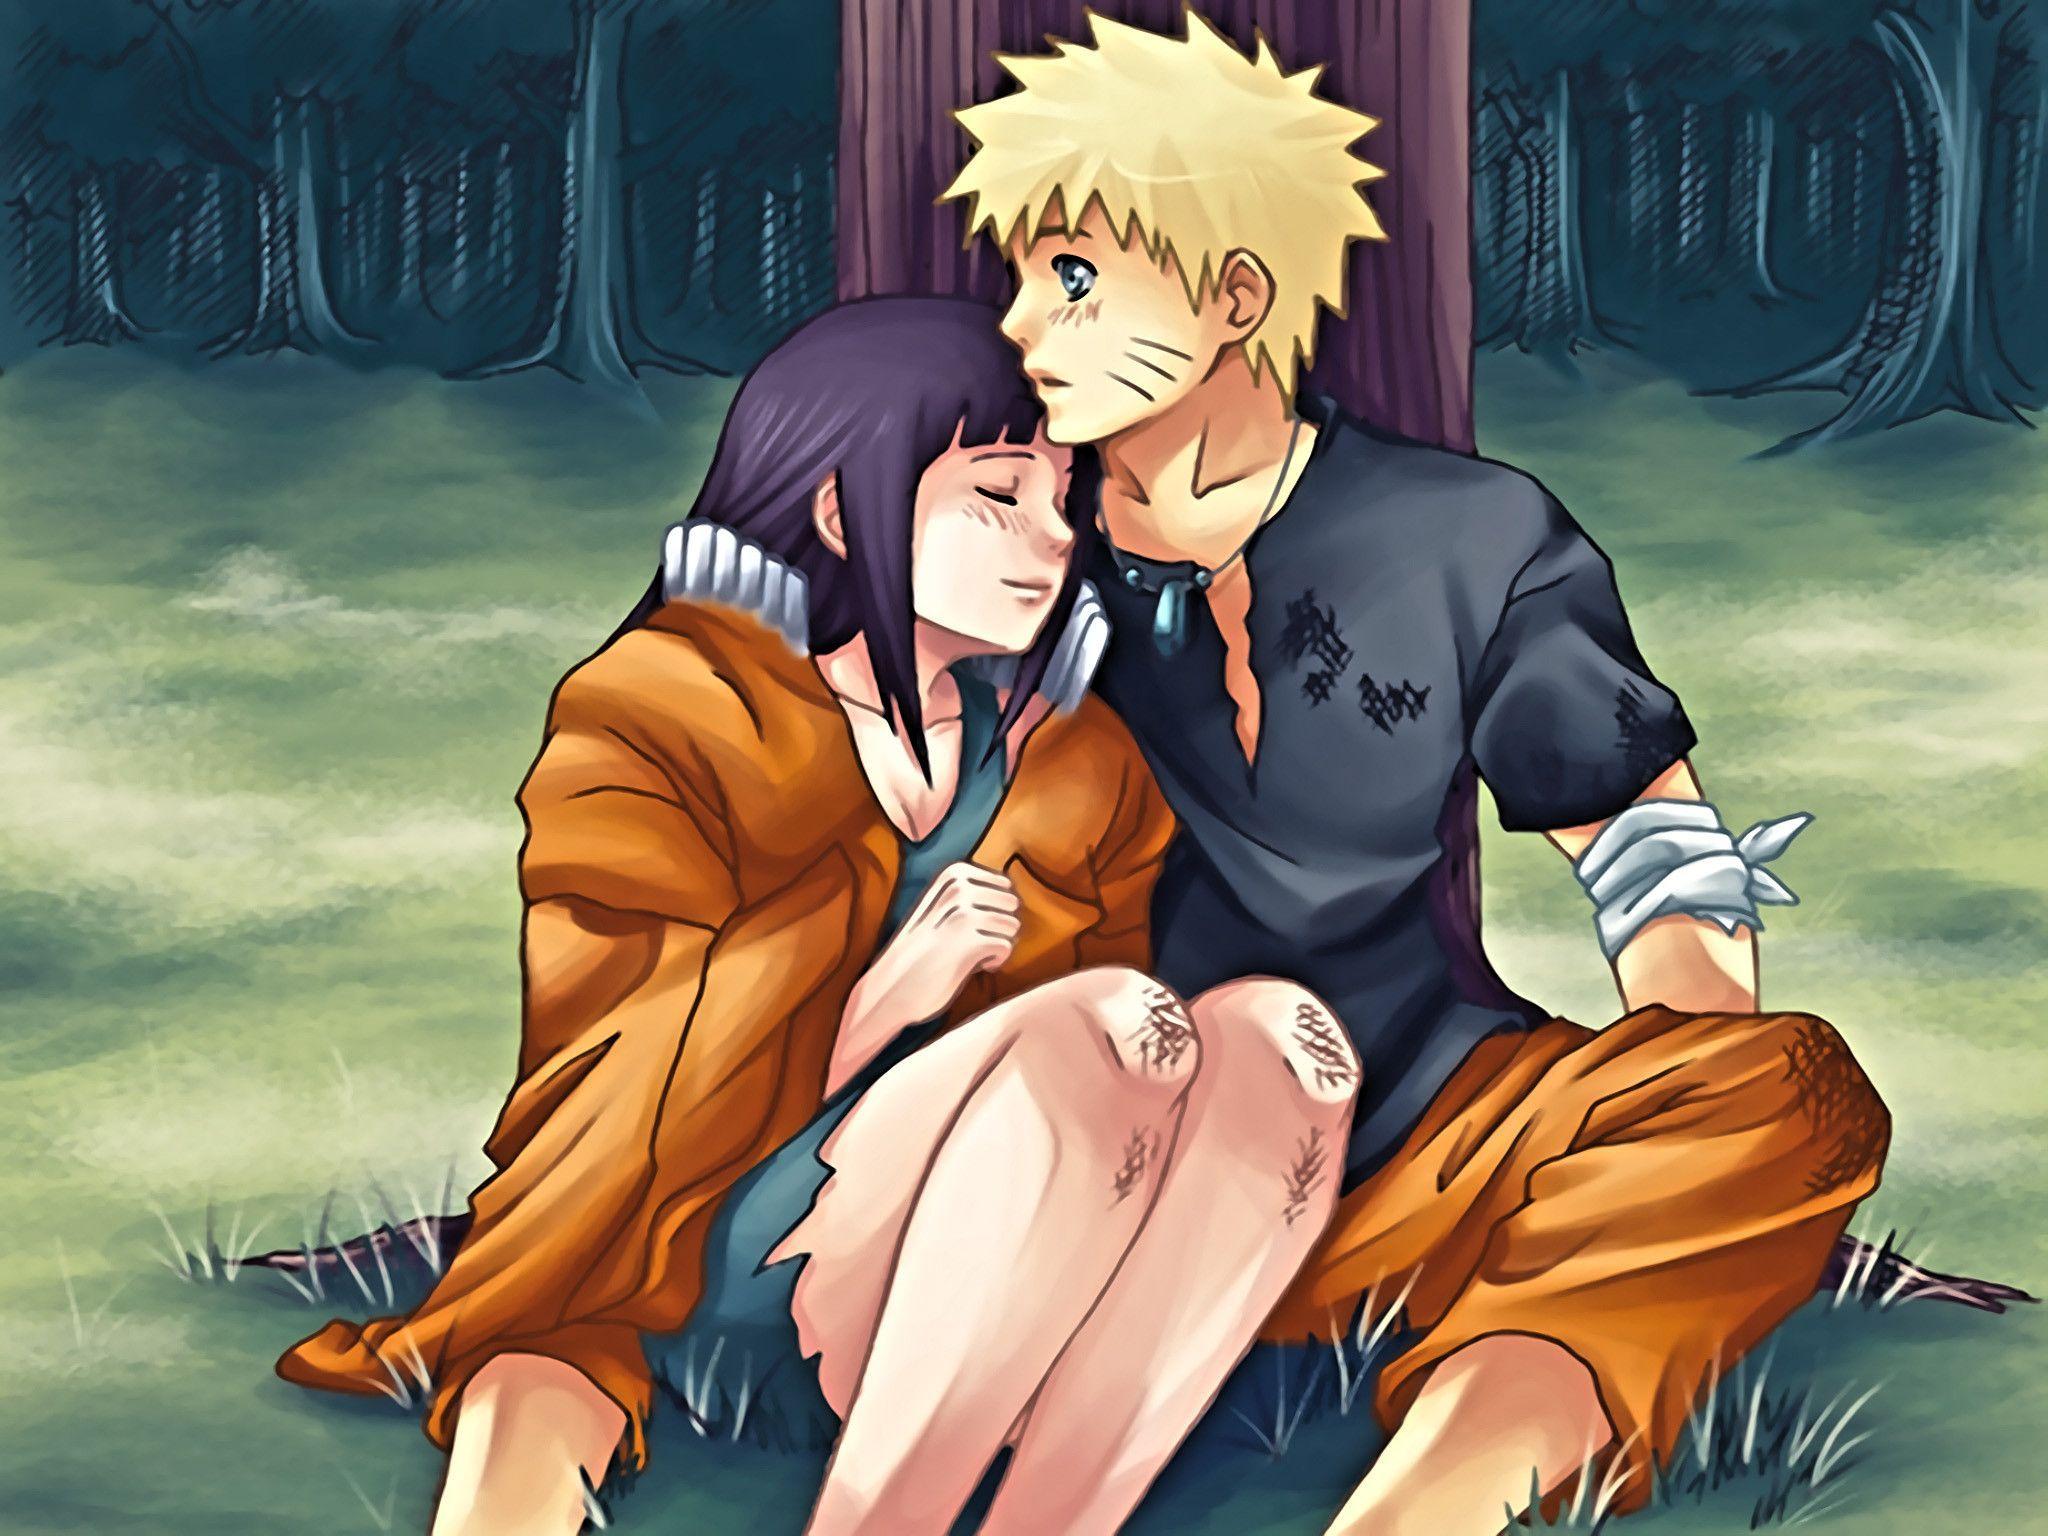 Fantastic Wallpaper Naruto Love - 644a1bd402e1022c06f8b7bbeabd3984  Collection_579348.jpg